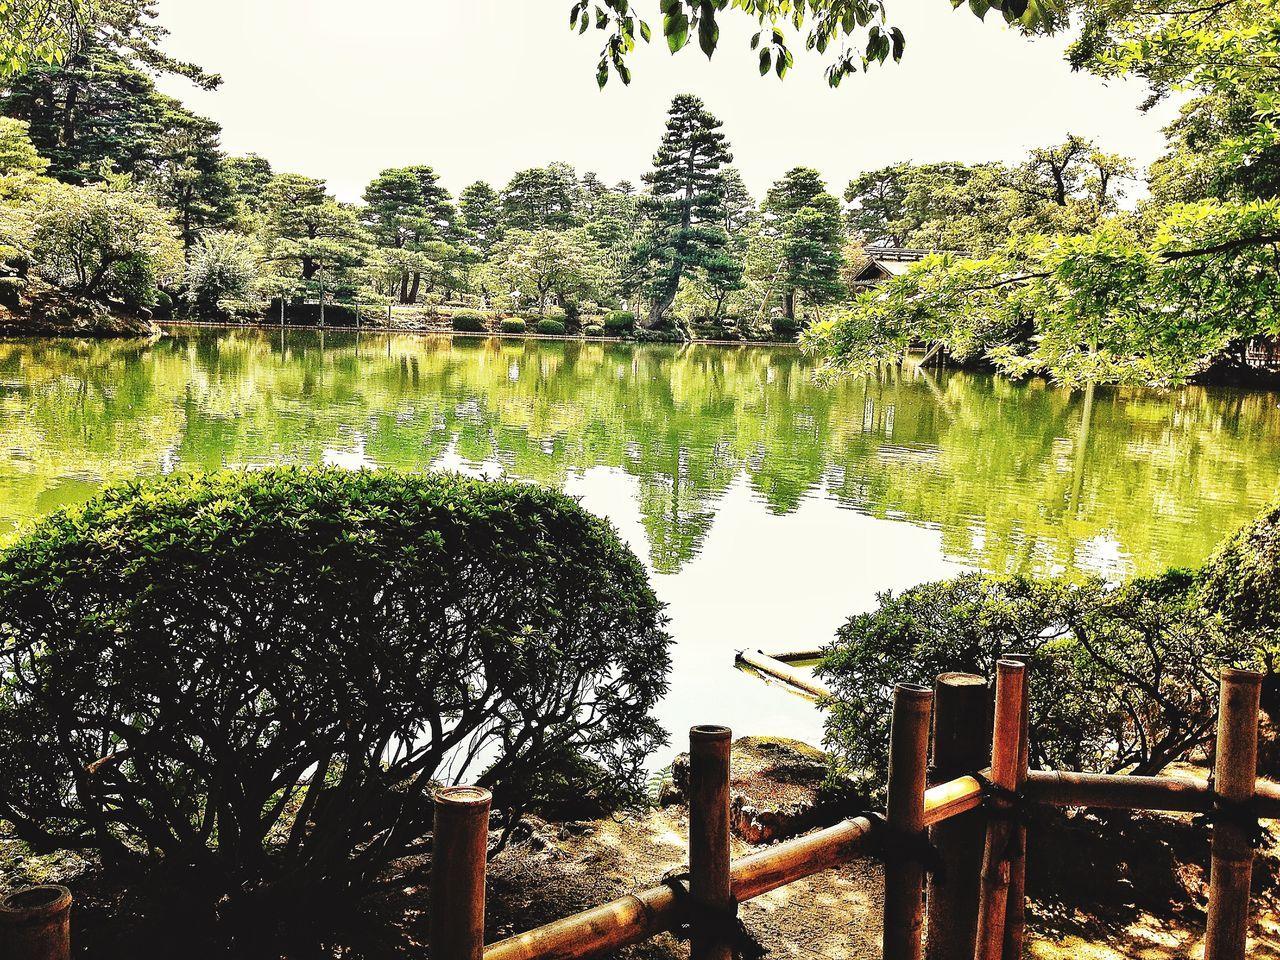 Ultimate Japan Kanazawa Kanazawa,japan EyeEm Nature Lover Japan Japanese Culture Japanese Style Japanese Garden